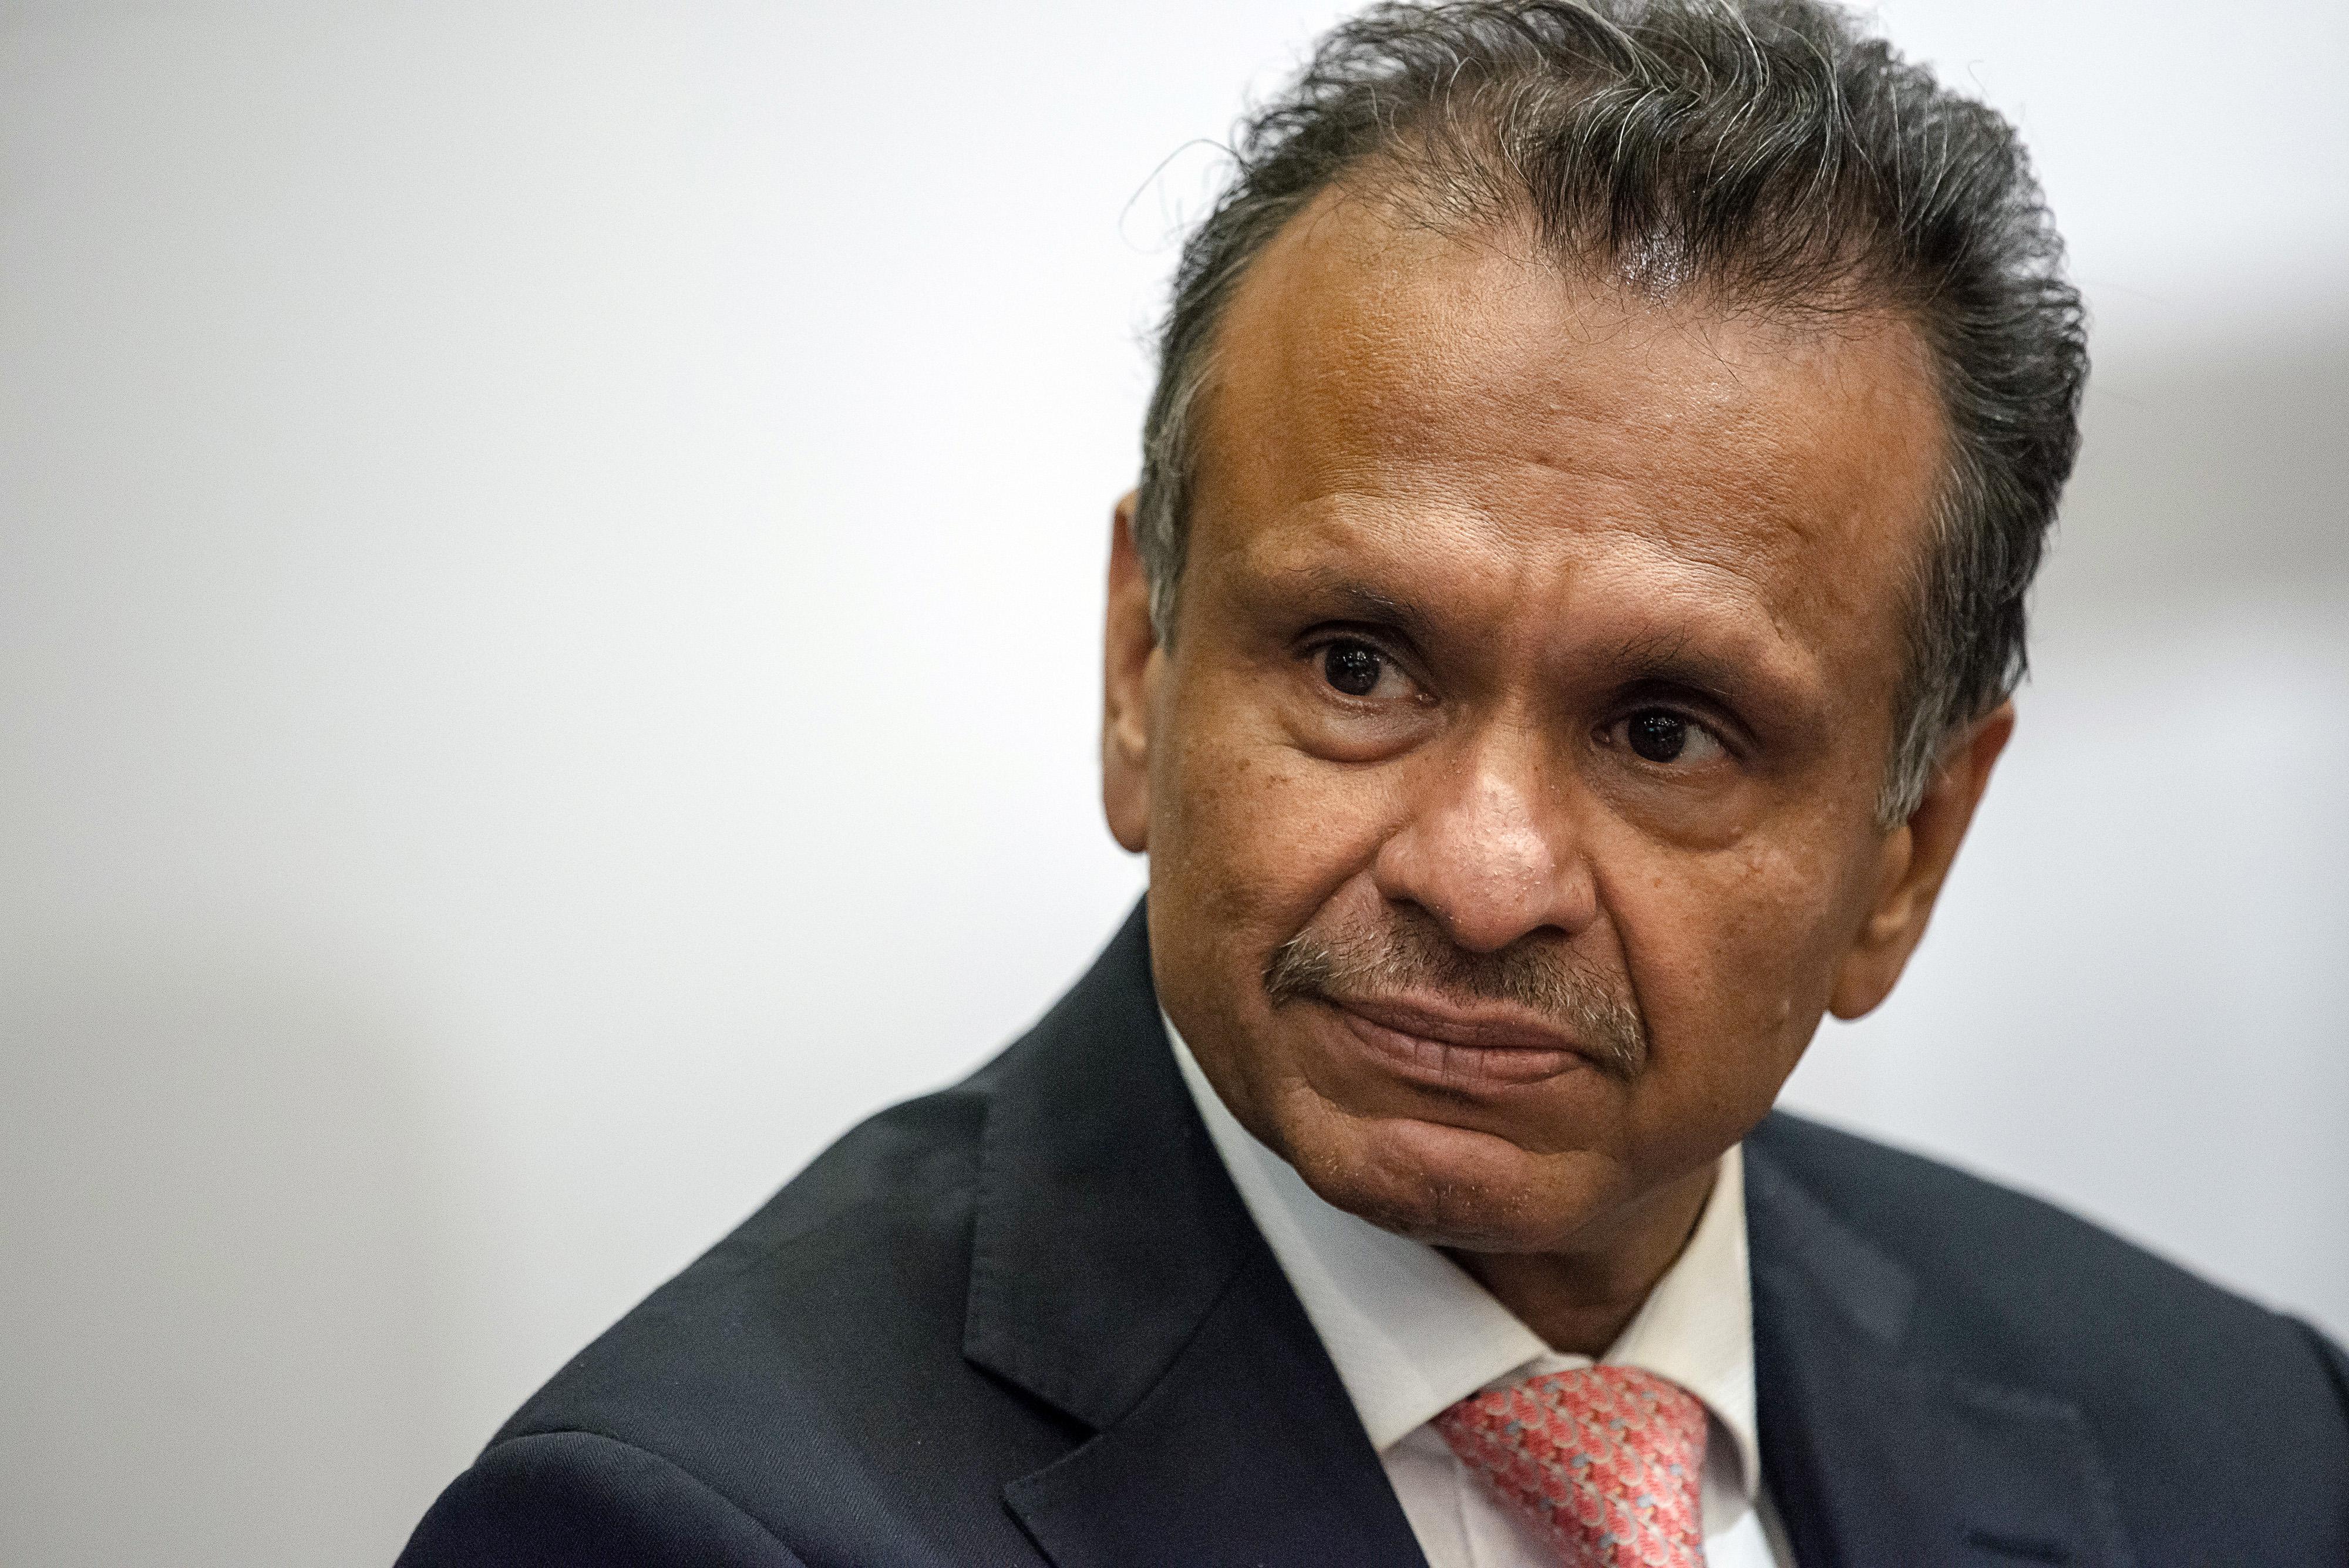 Samsonite CEO Ramesh Tainwala Interview